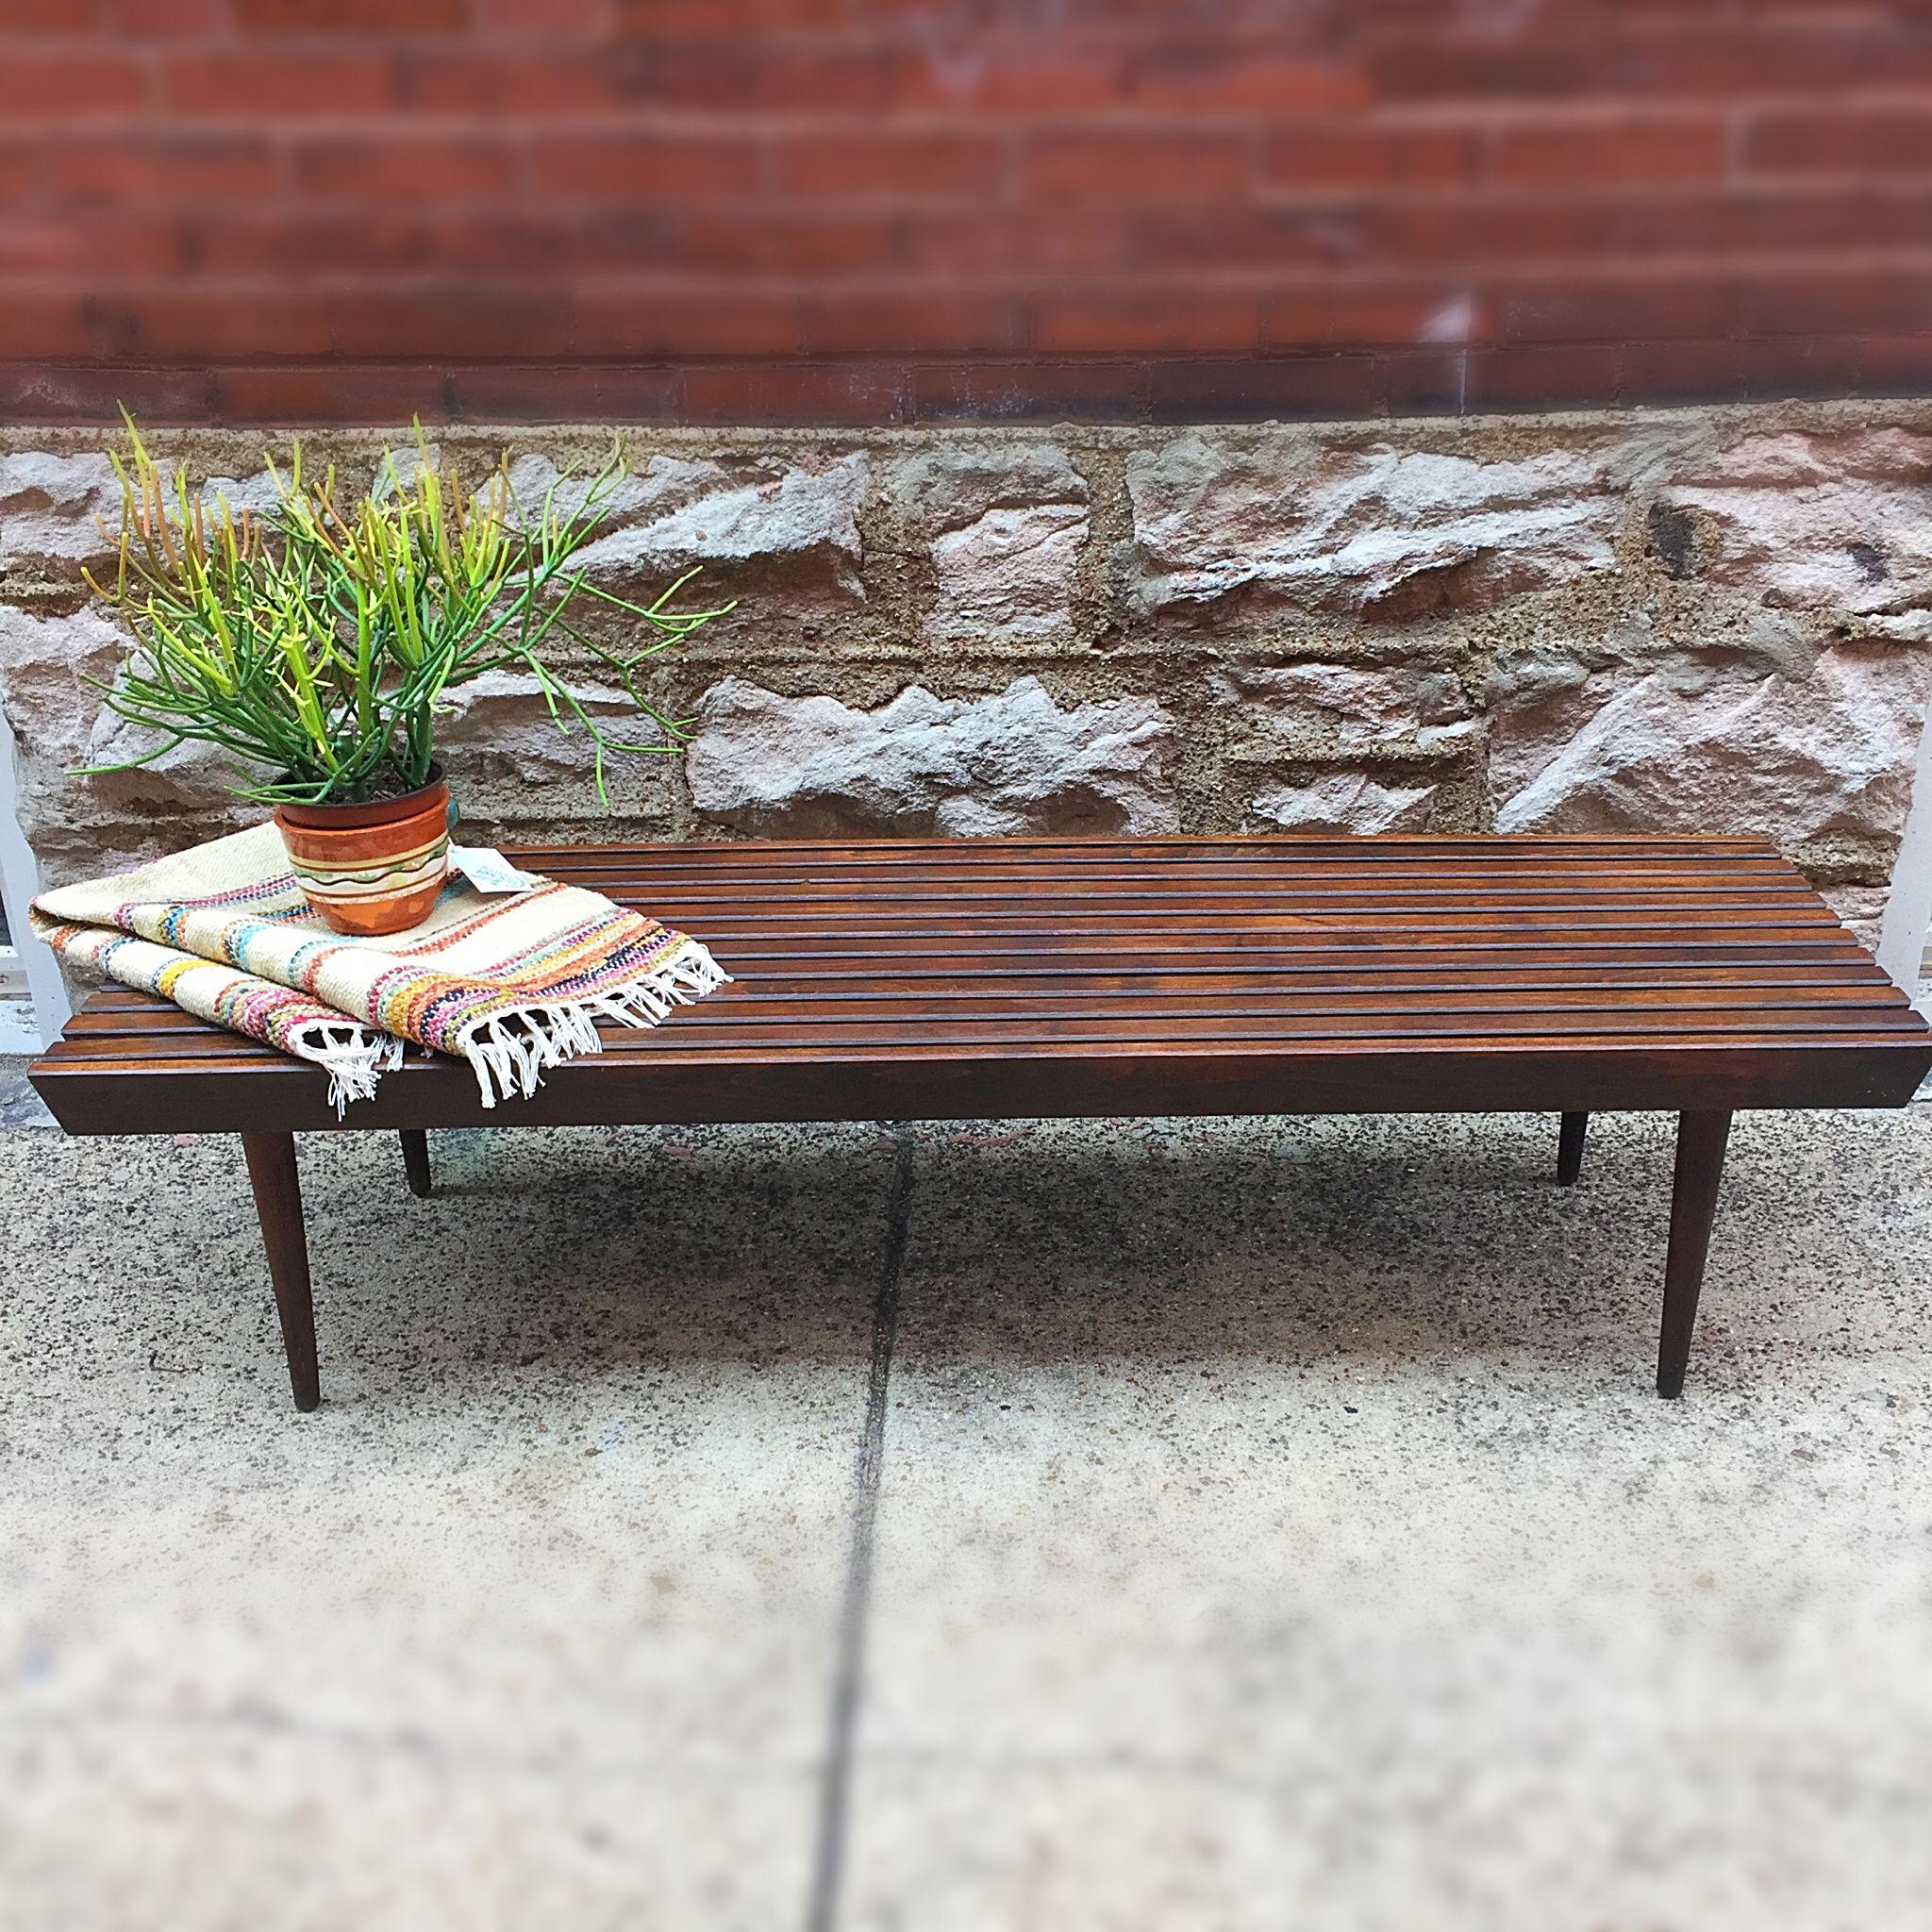 Mid Century Modern Walnut Slat Bench Coffee Table Vintage Mid Century Modern Walnut Slat Bench Co Coffee Table Vintage Coffee Table Modern Vintage Furniture [ 2048 x 2048 Pixel ]